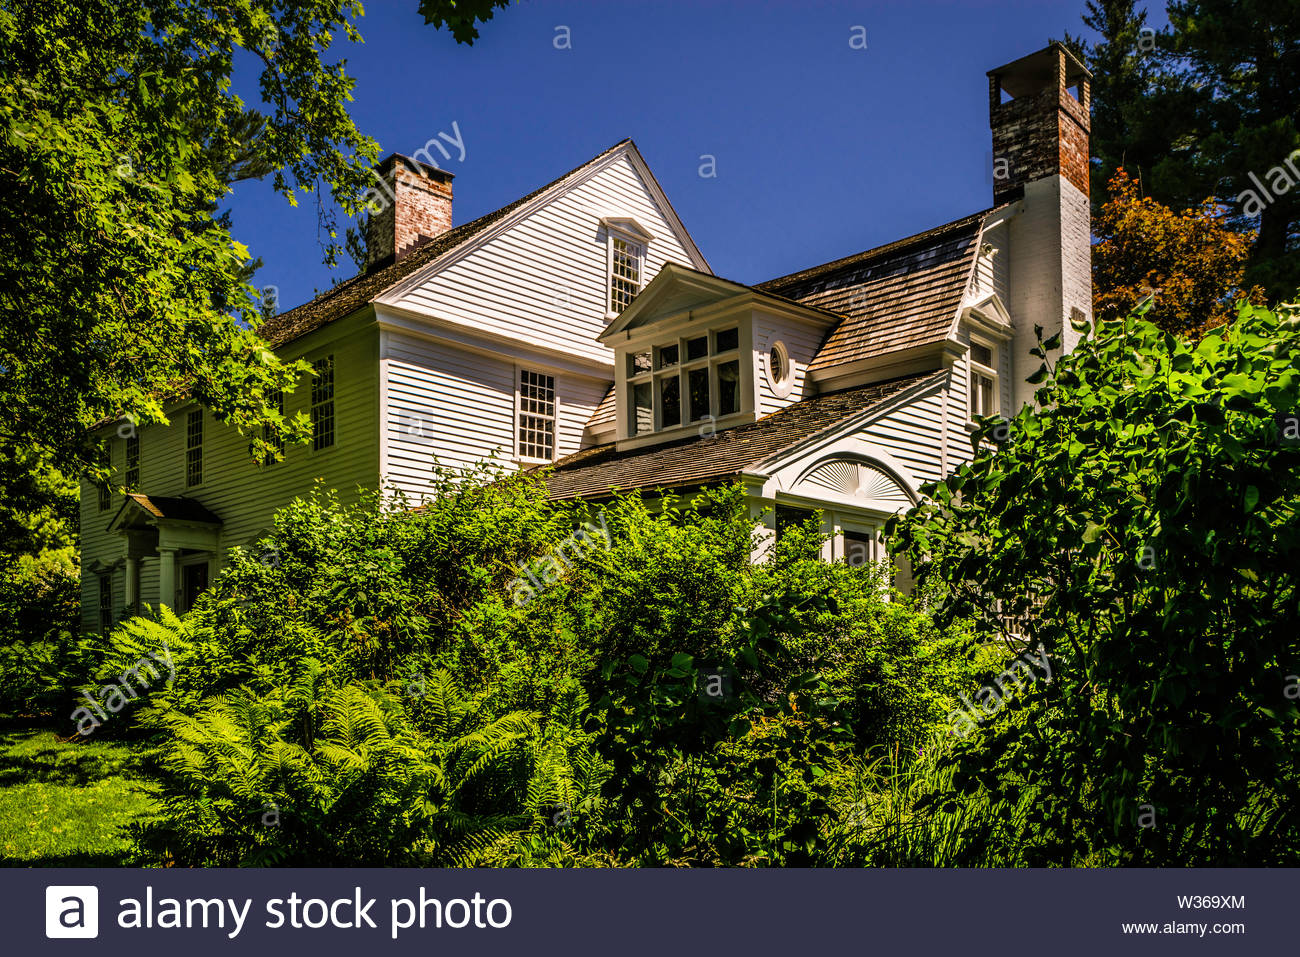 Oliver Wolcott House Litchfield Historic District _ Litchfield, Connecticut, USA - Stock Image